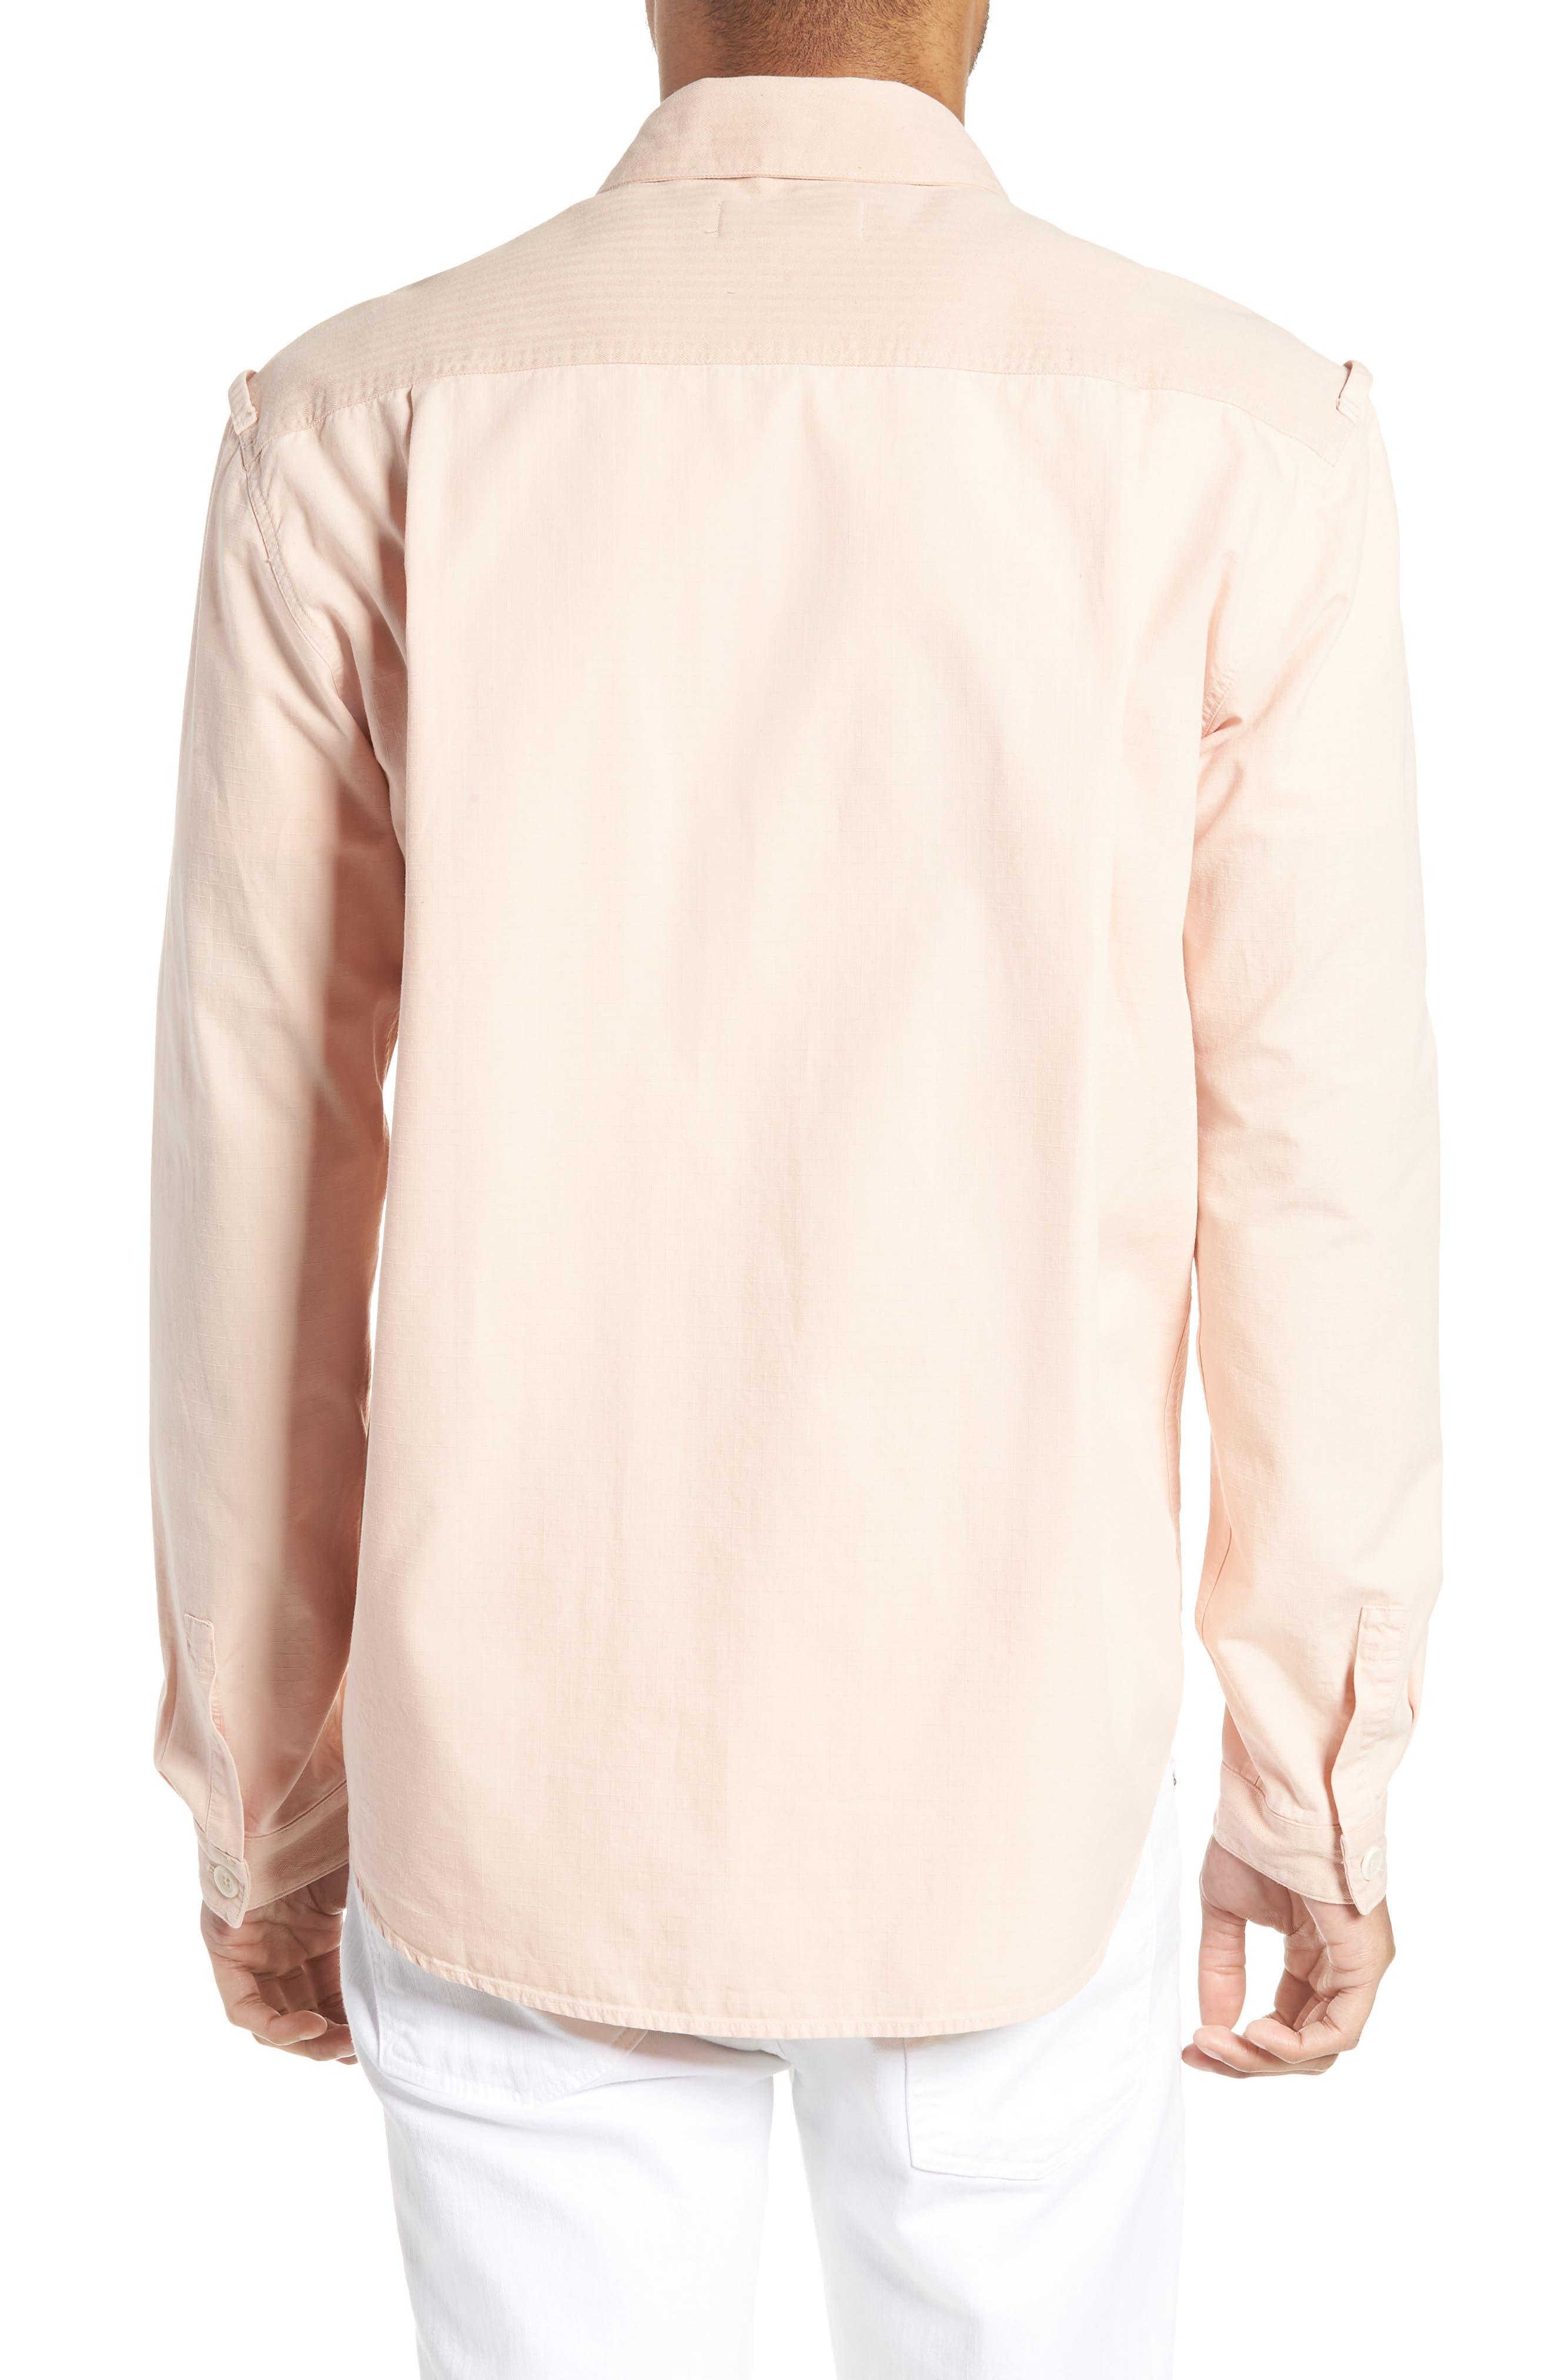 Doc Savage Slim Fit Sport Shirt,                             Alternate thumbnail 2, color,